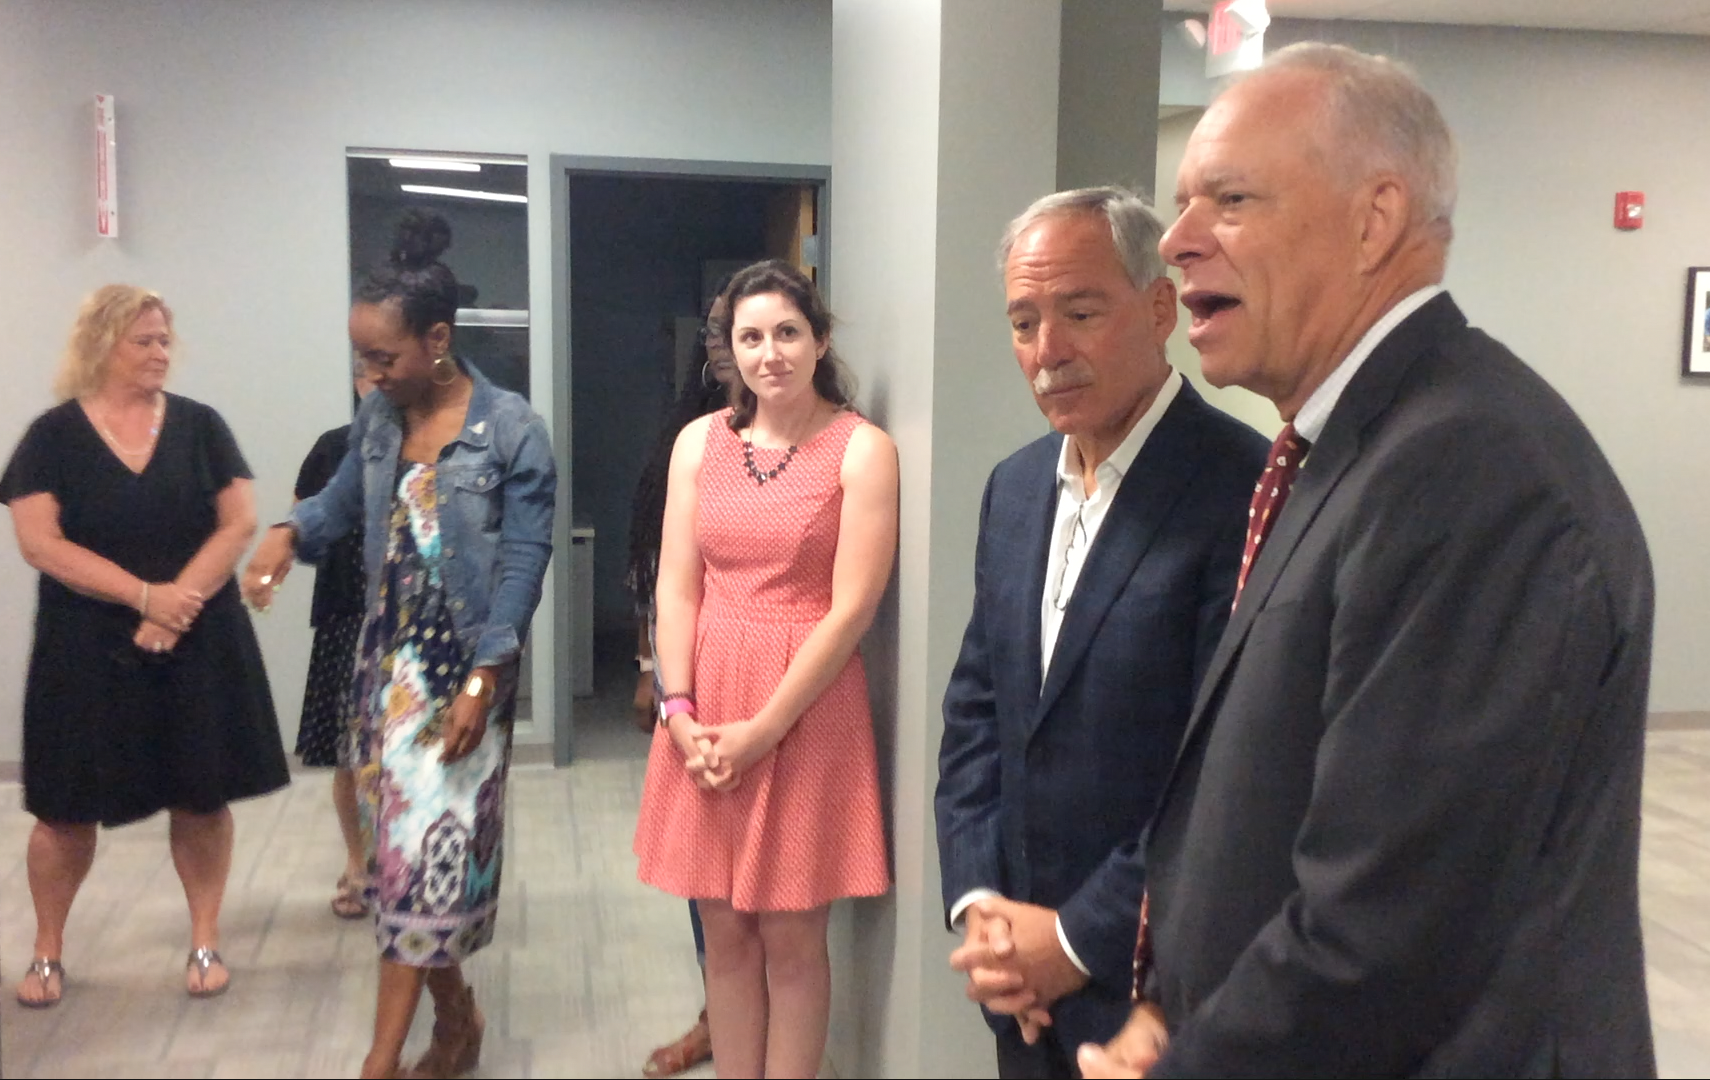 Homeport President & CEO Bruce Luecke, right, introduced Robert Schottenstein to Homeport staff.